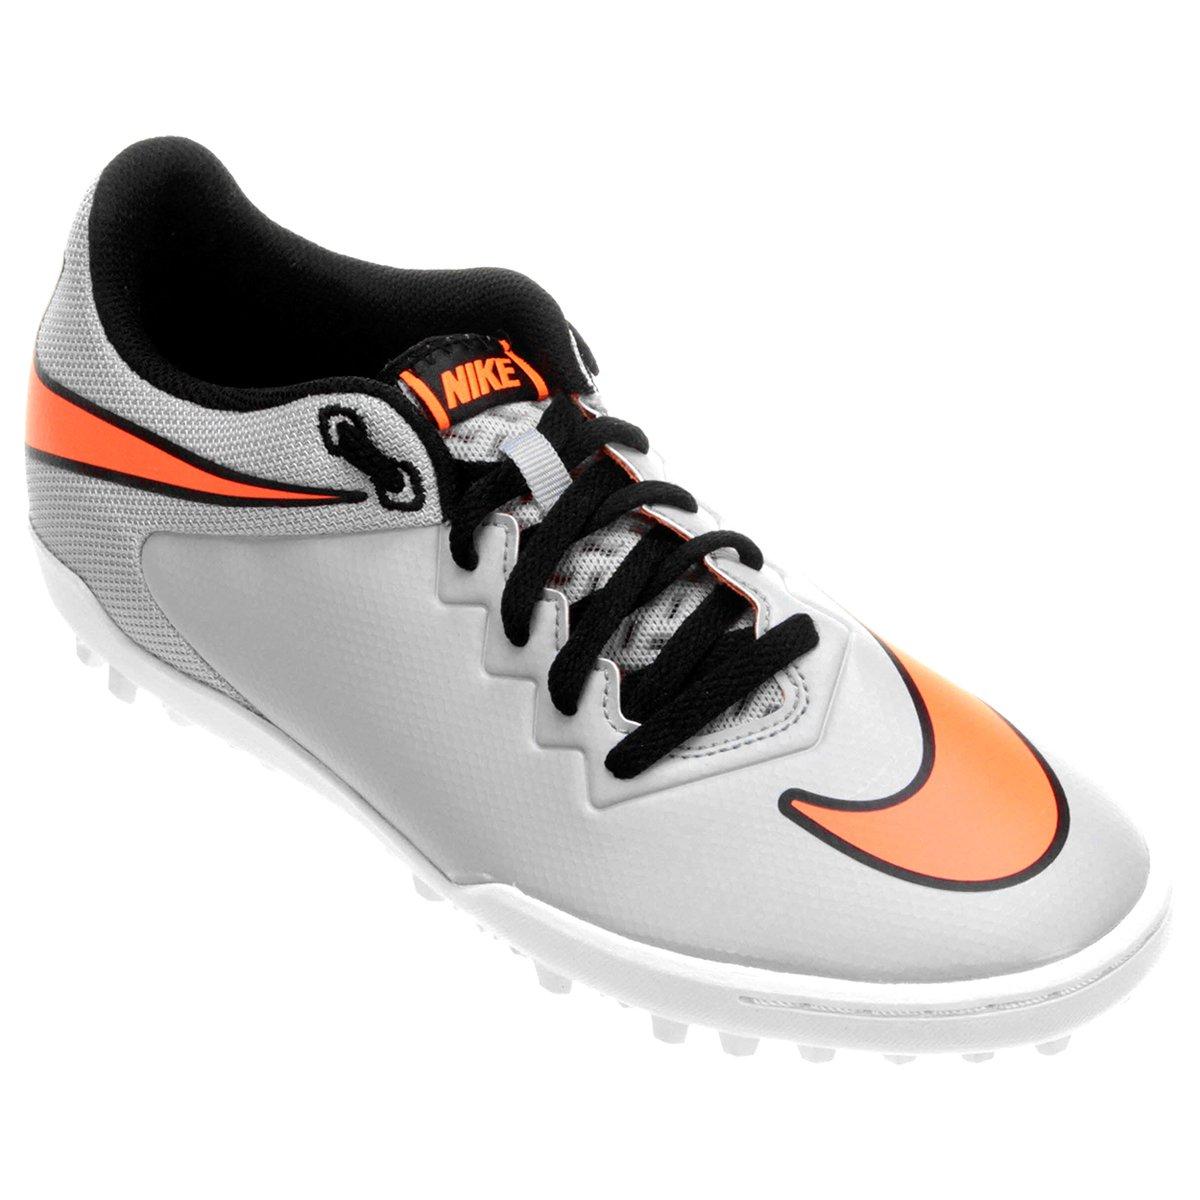 huge selection of 46367 d0534 Chuteira Society Nike Hypervenom Pro TF | Loja do Inter